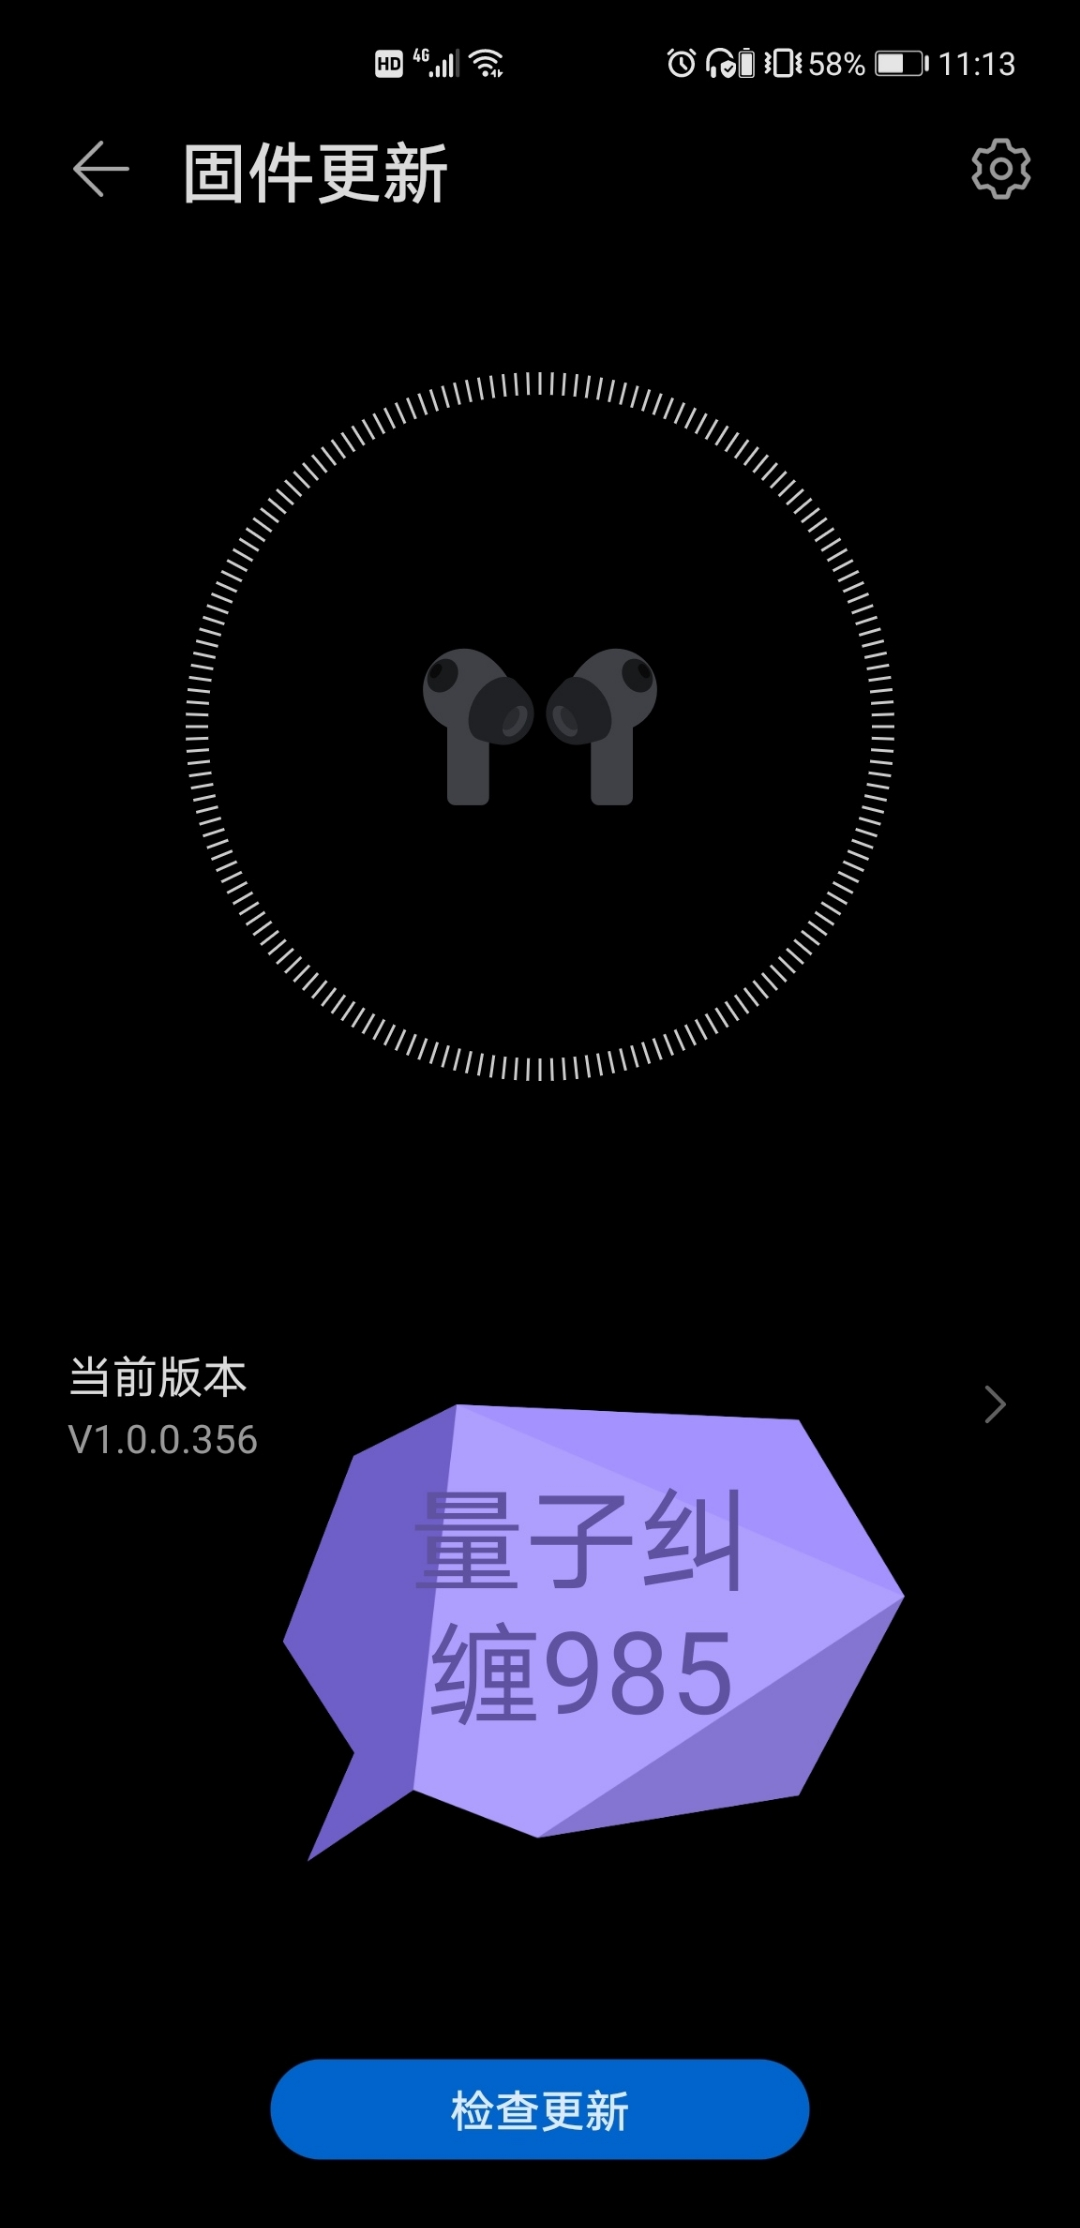 Screenshot_20210329_111300_com.huawei.smarthome_edit_4536775334203.jpg